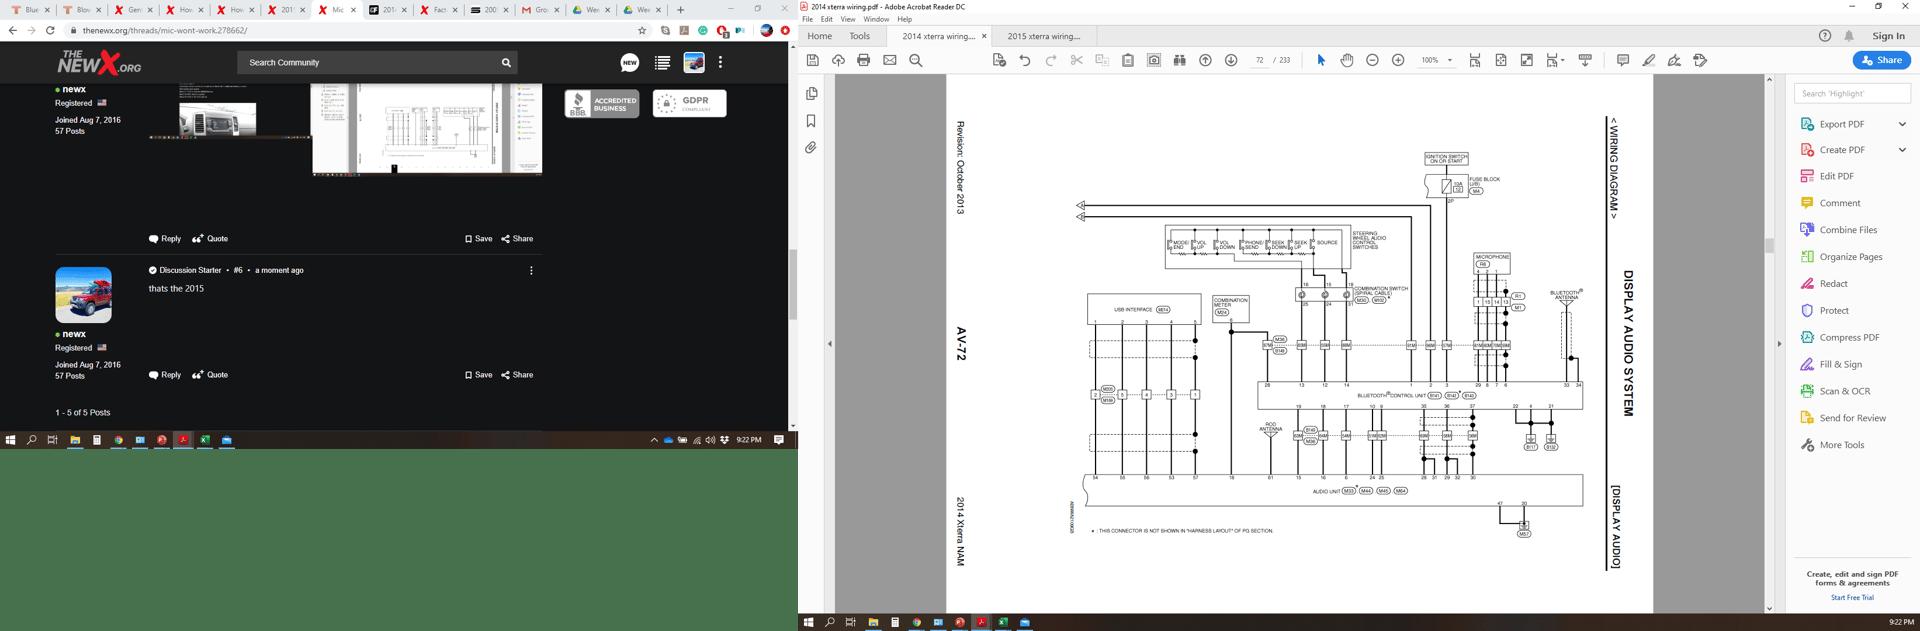 Kenwood Ddx375Bt Wiring Diagram from www.thenewx.org